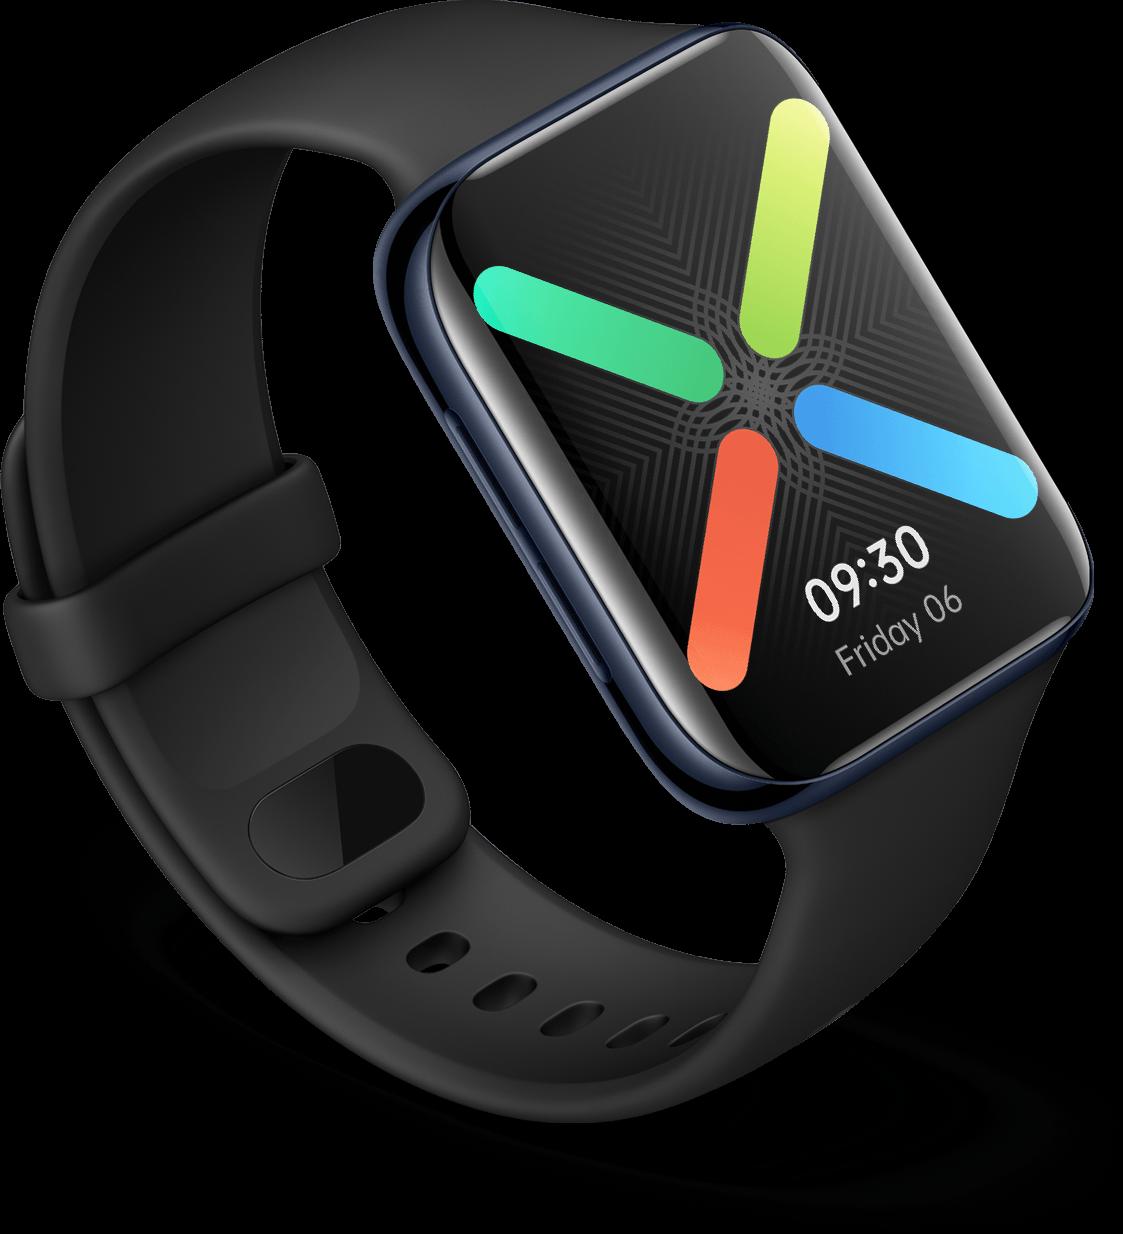 Wear OS Watch, Watches with wear os, techliq, techliq.com, Top smartwatches, oneplus, oppo, smartwatch